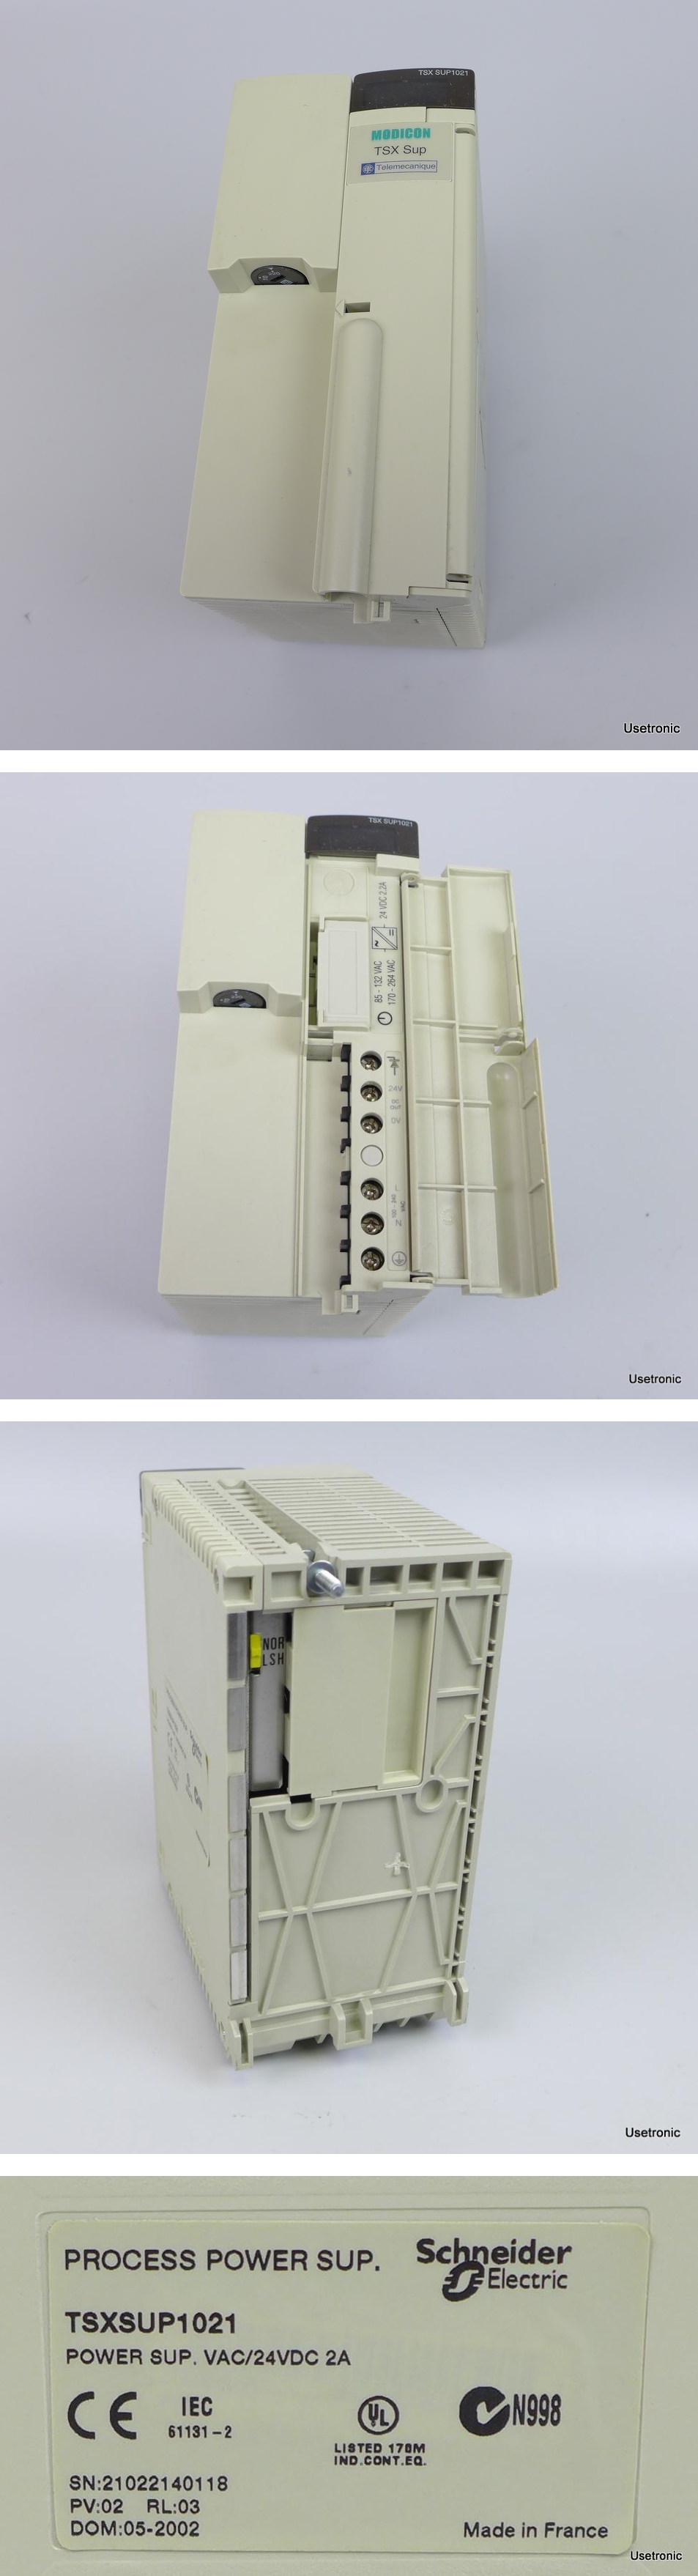 Telemecanique Schneider TSX SUP 1021